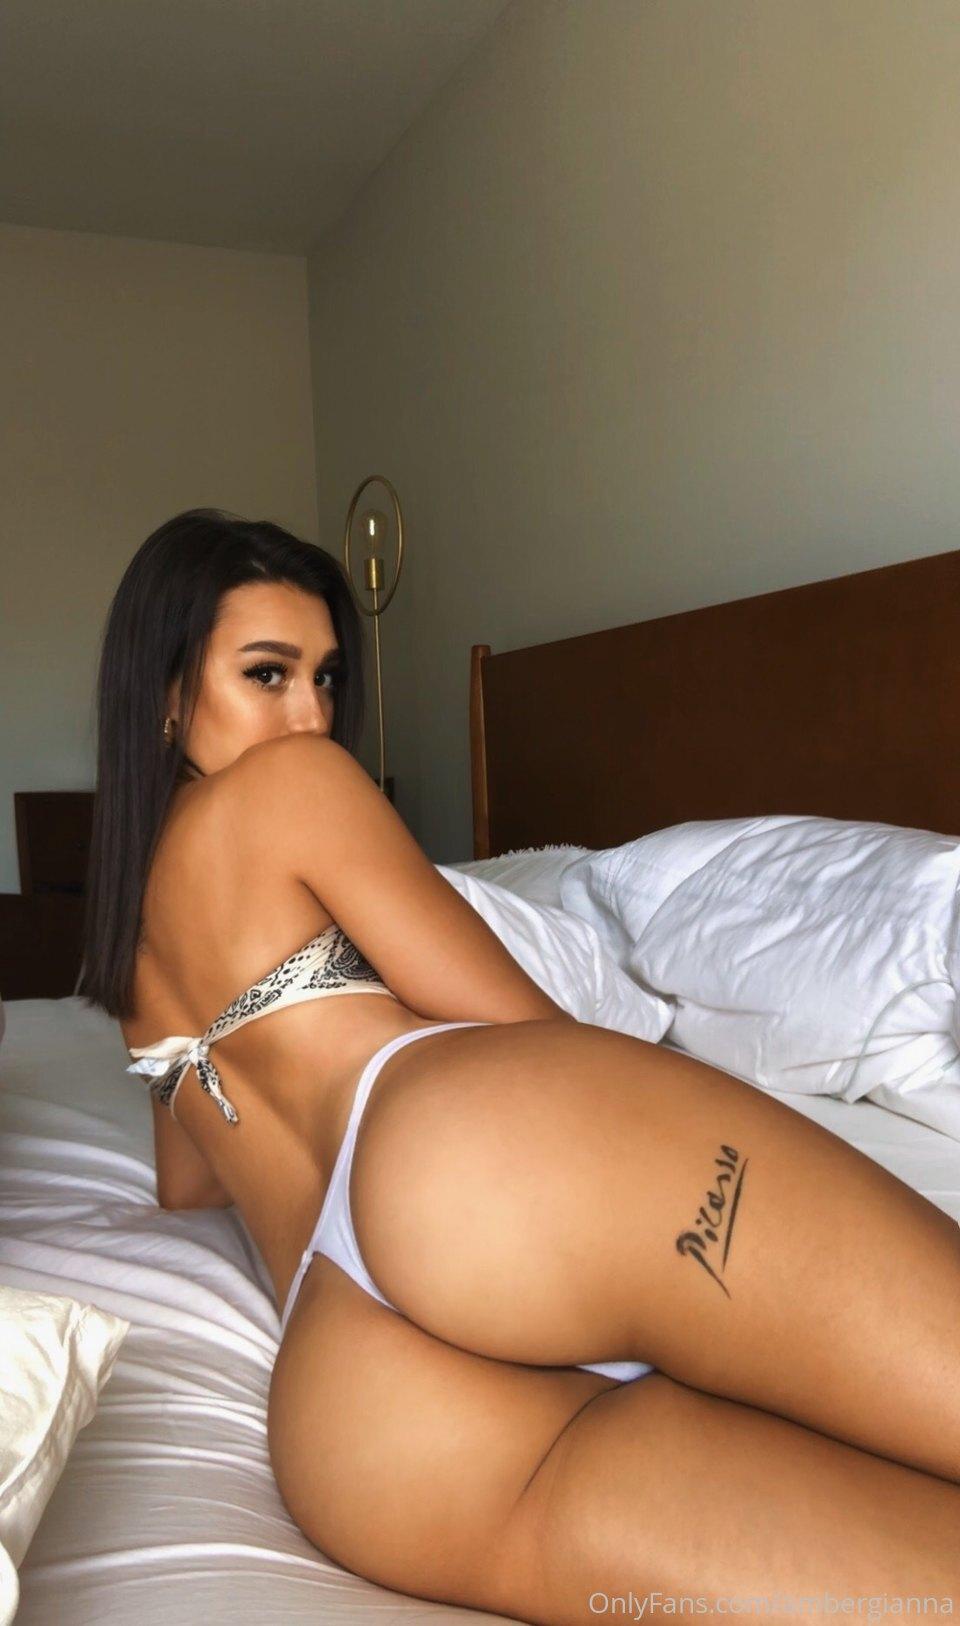 Amber Gianna Onlyfans 0080